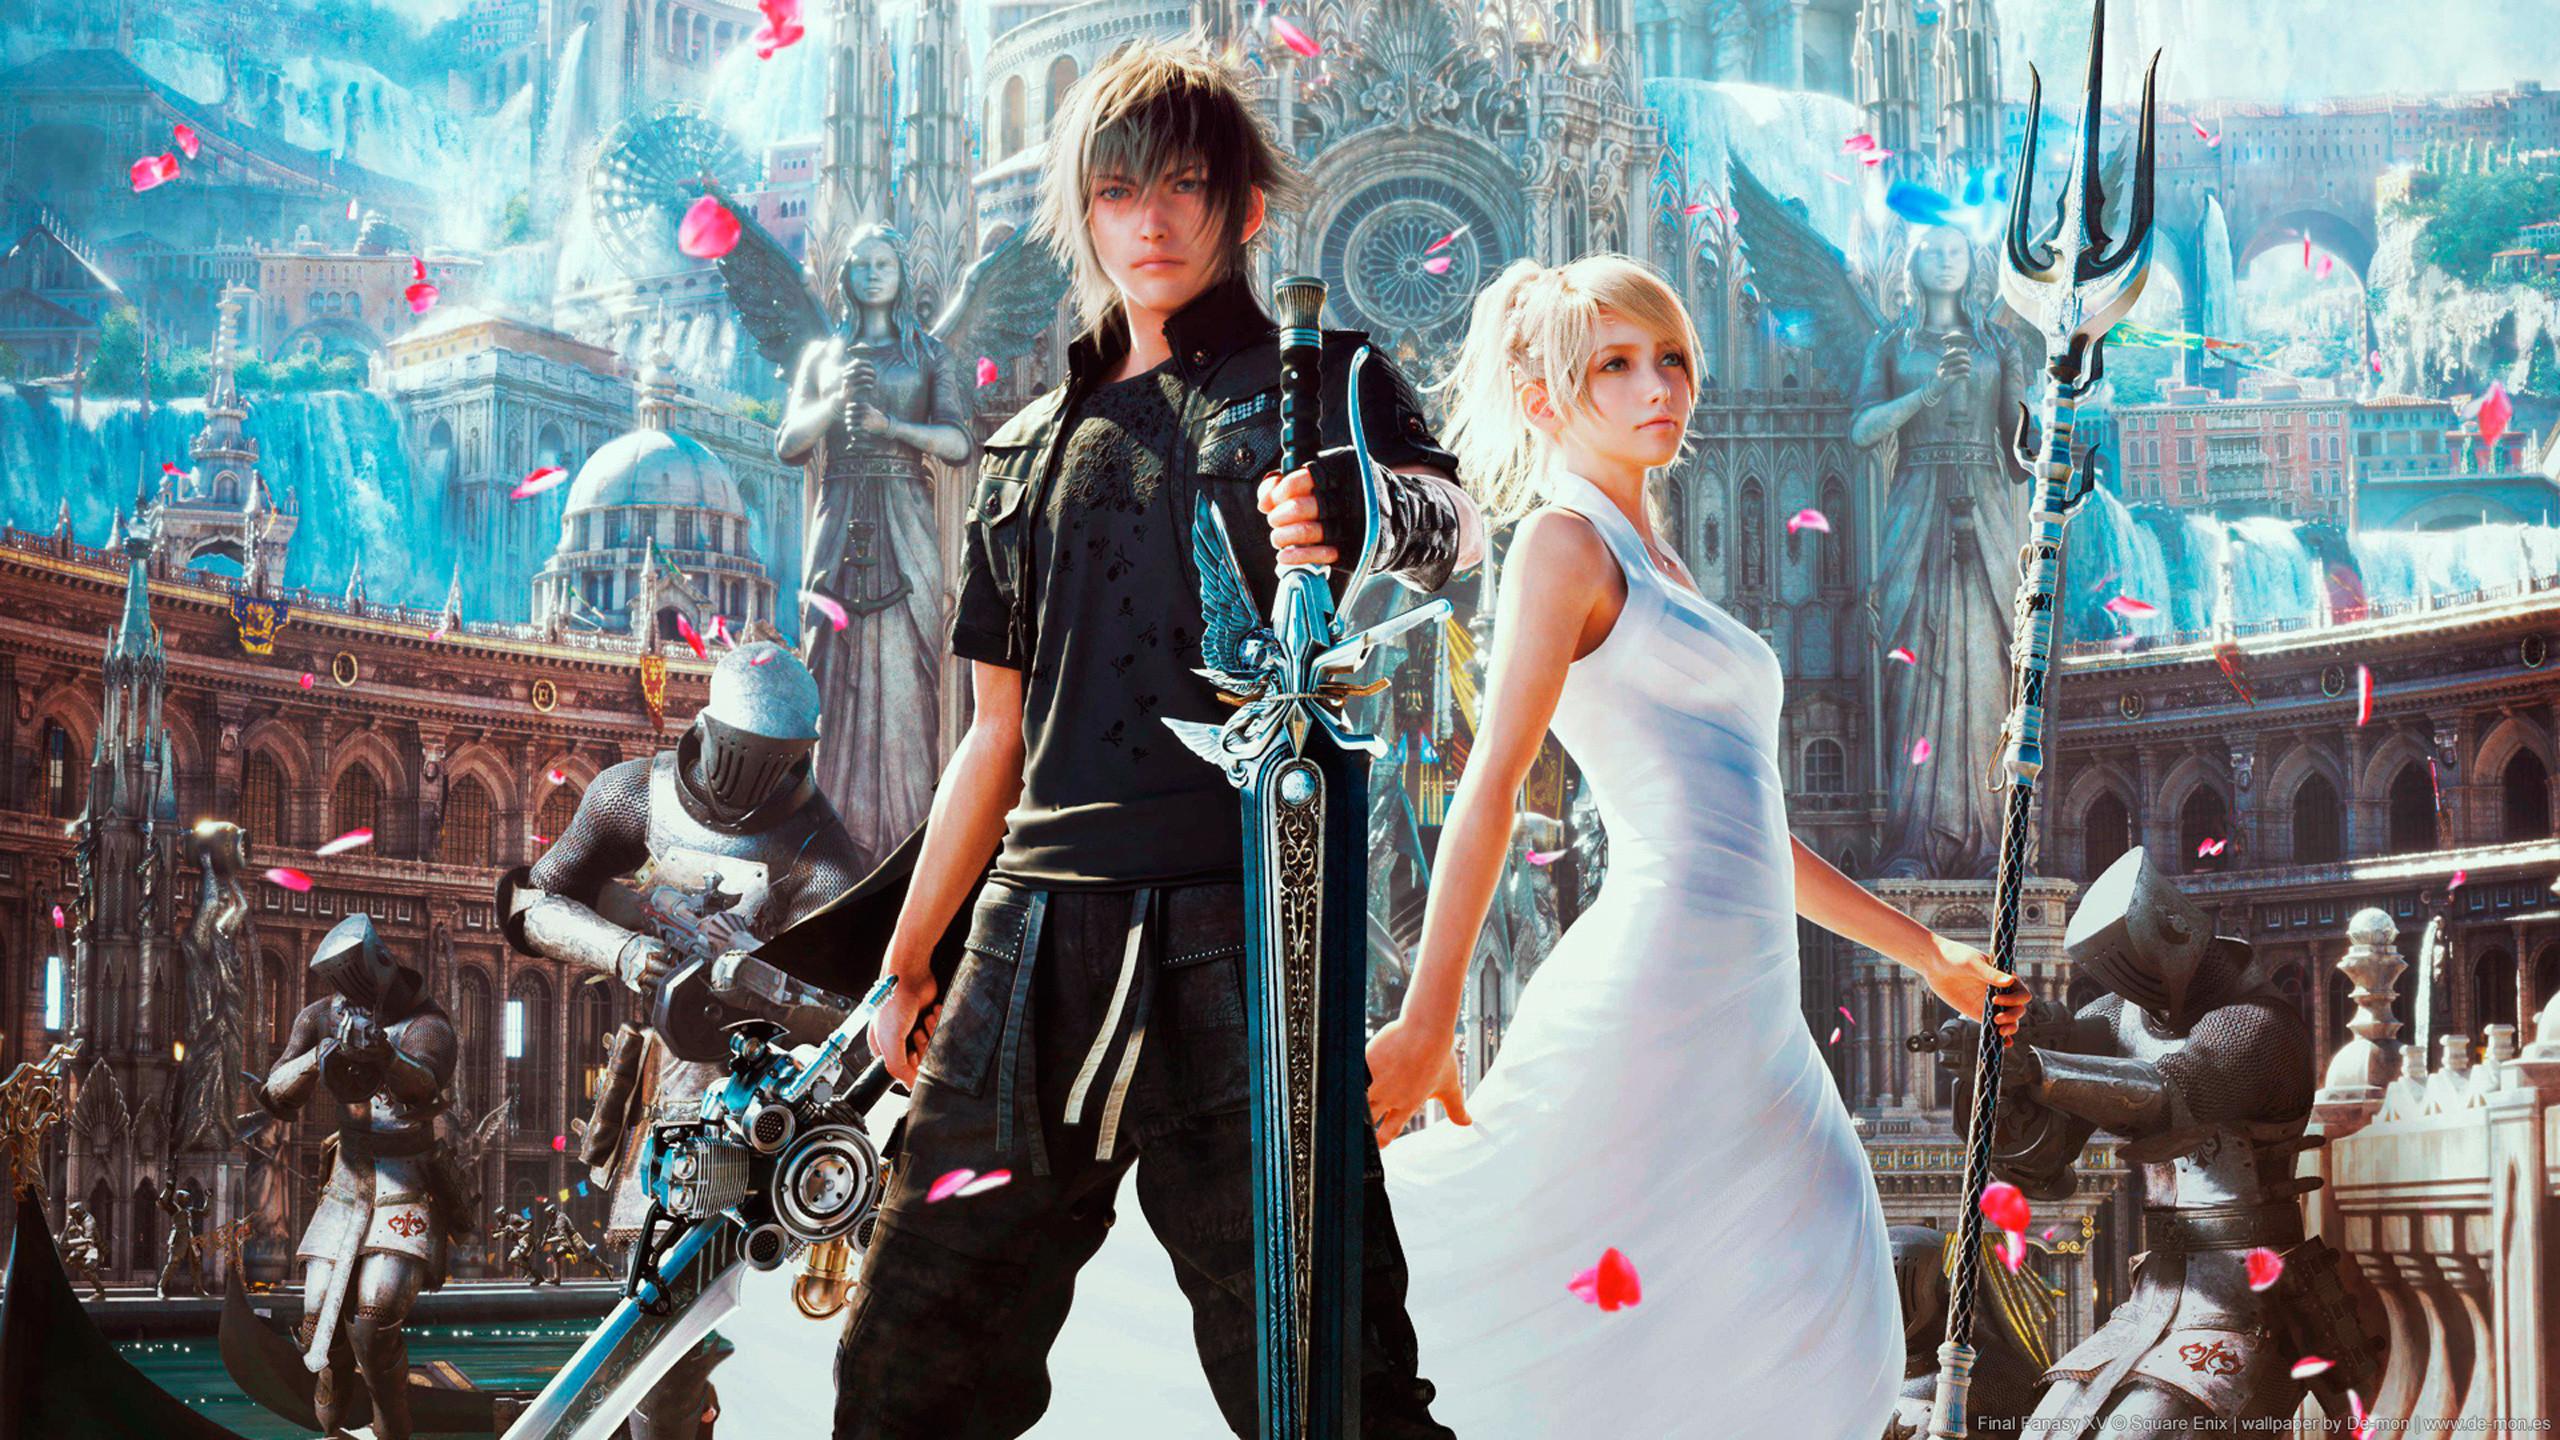 Final Fantasy XV Artwork HD